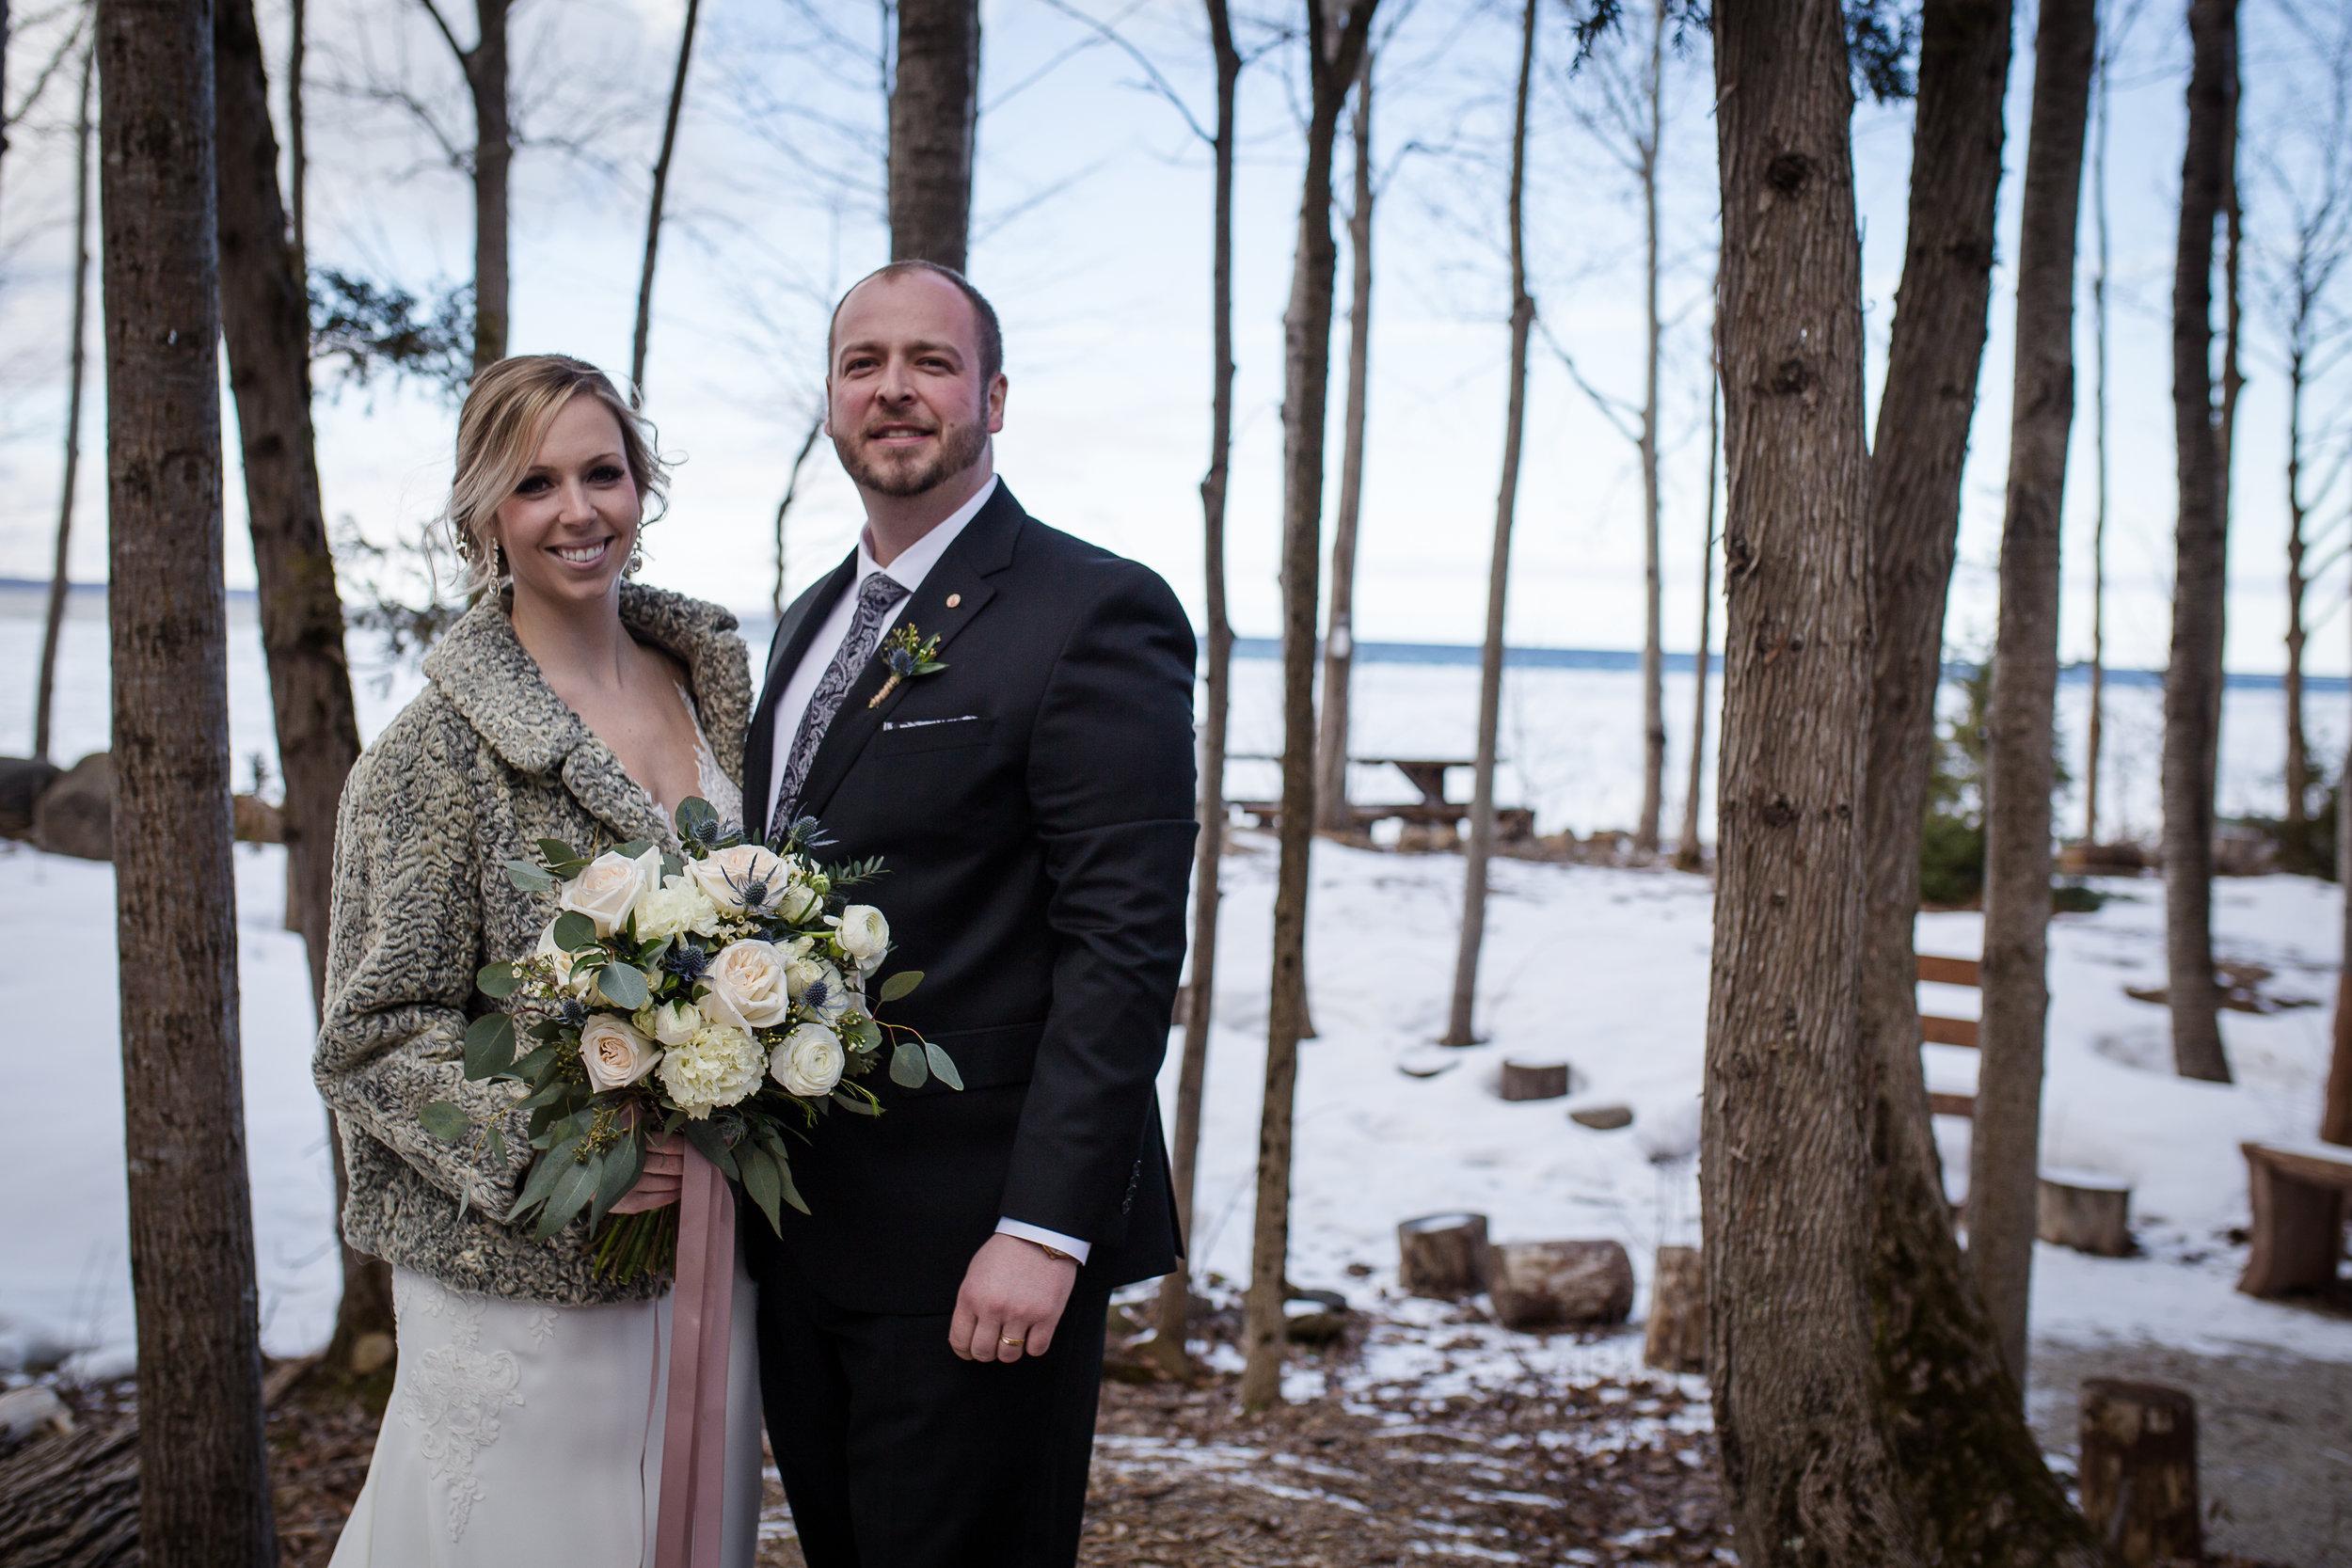 The-Griffiths-Wedding-10-03-10-172.jpg